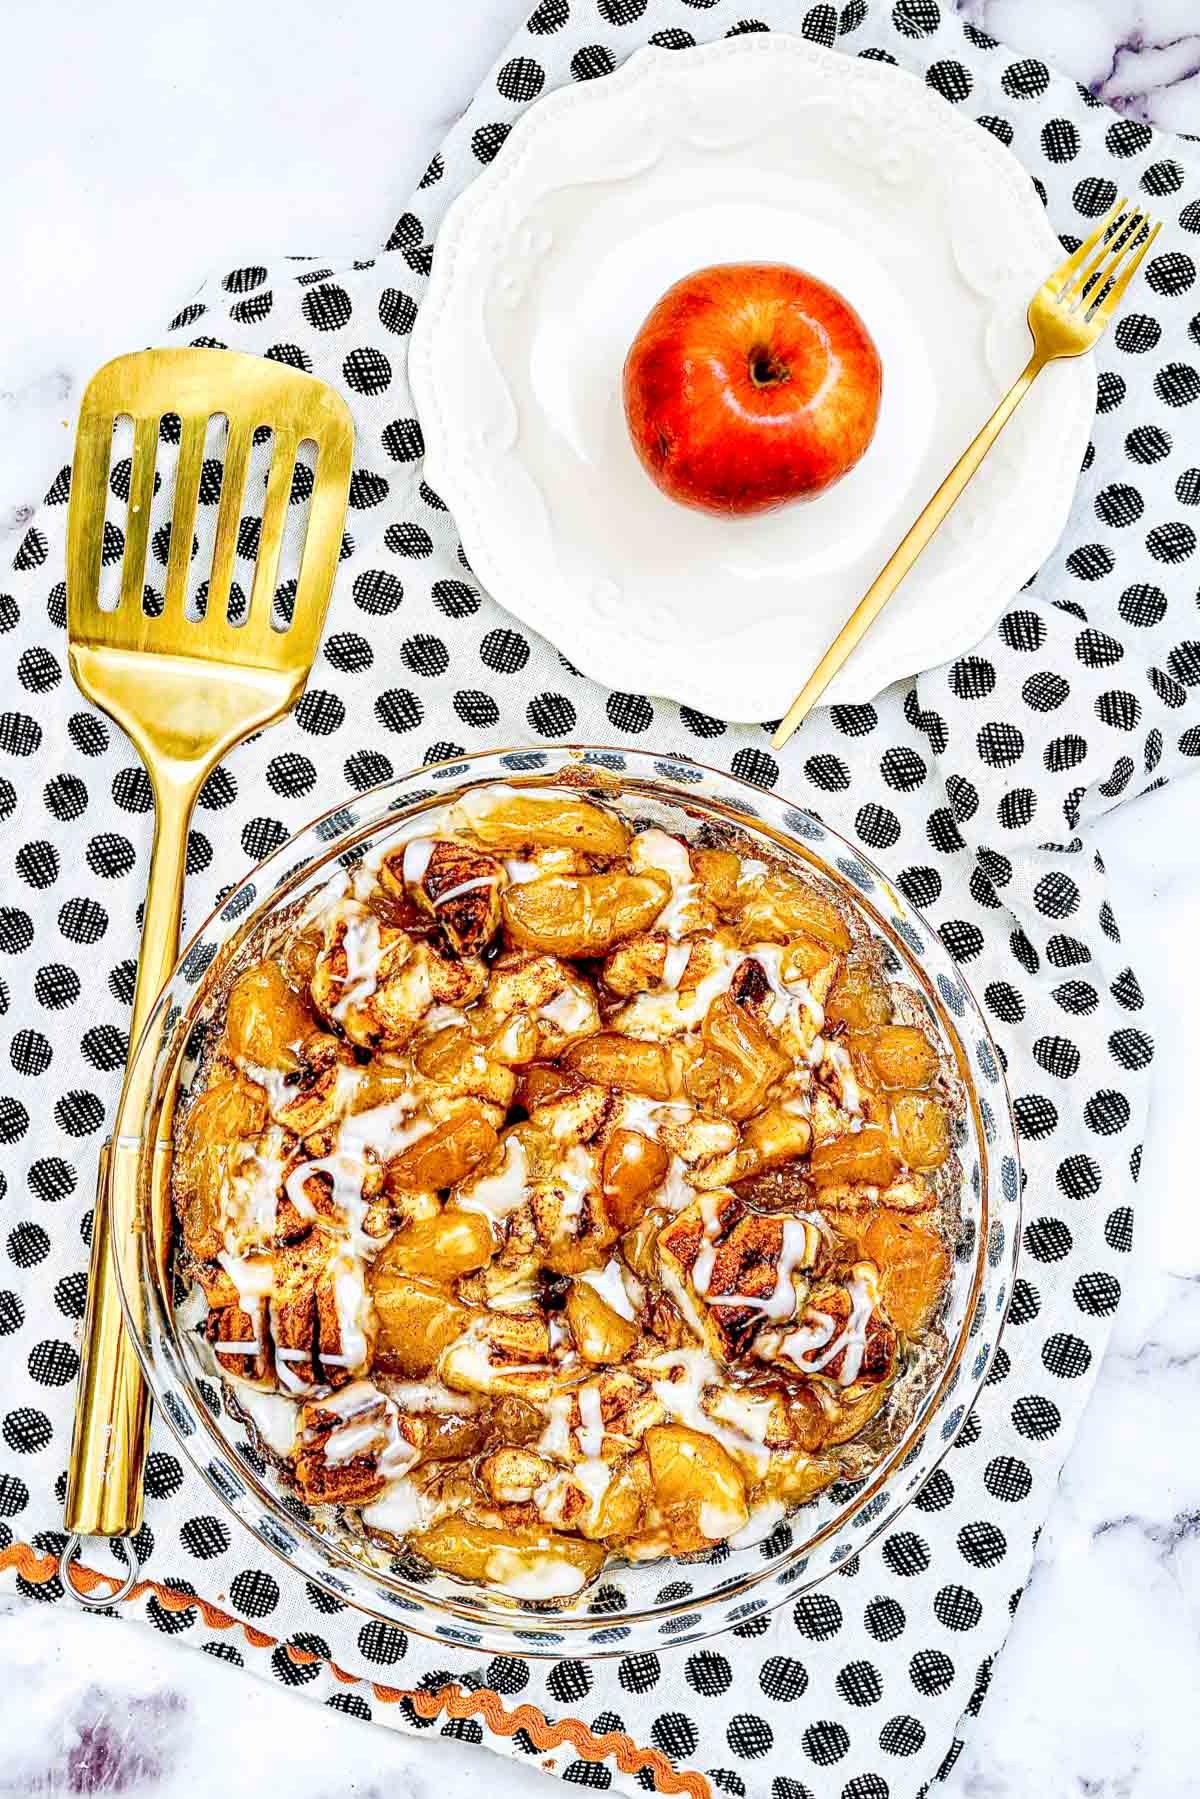 easy apple cobbler with cinnamon rolls